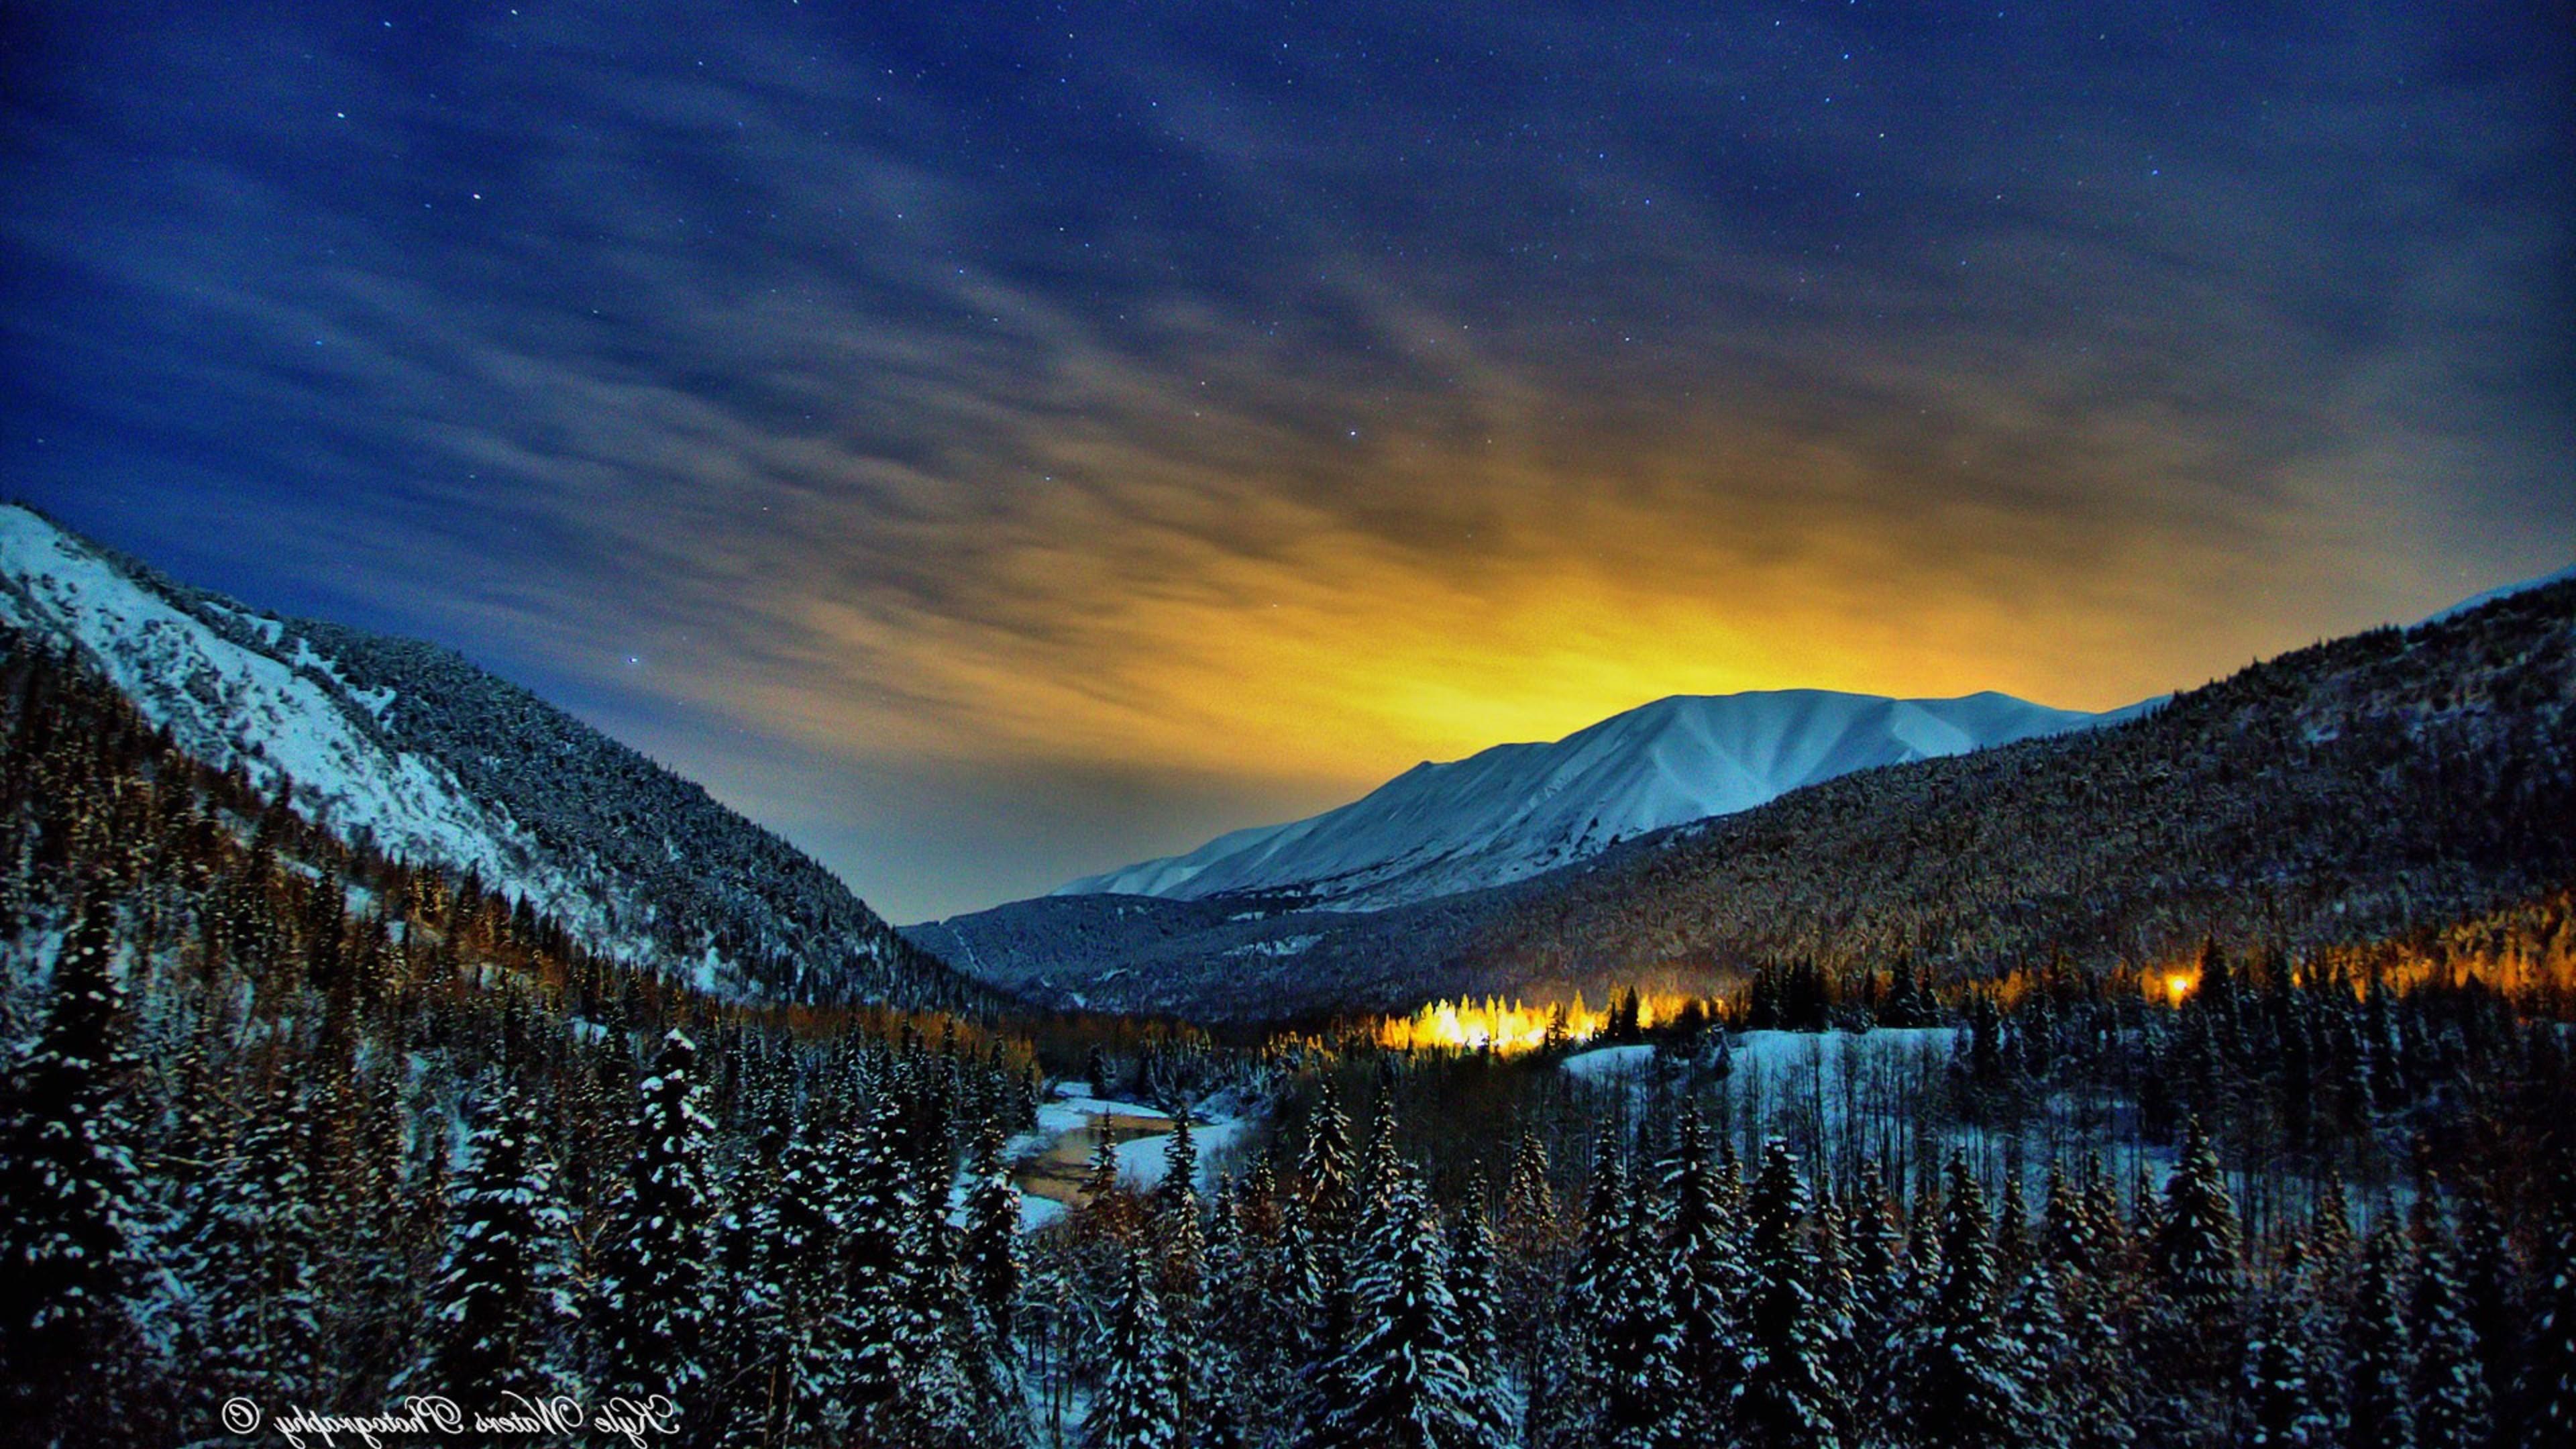 alaska winter nights 1535930779 - Alaska Winter Nights - winter wallpapers, nights wallpapers, nature wallpapers